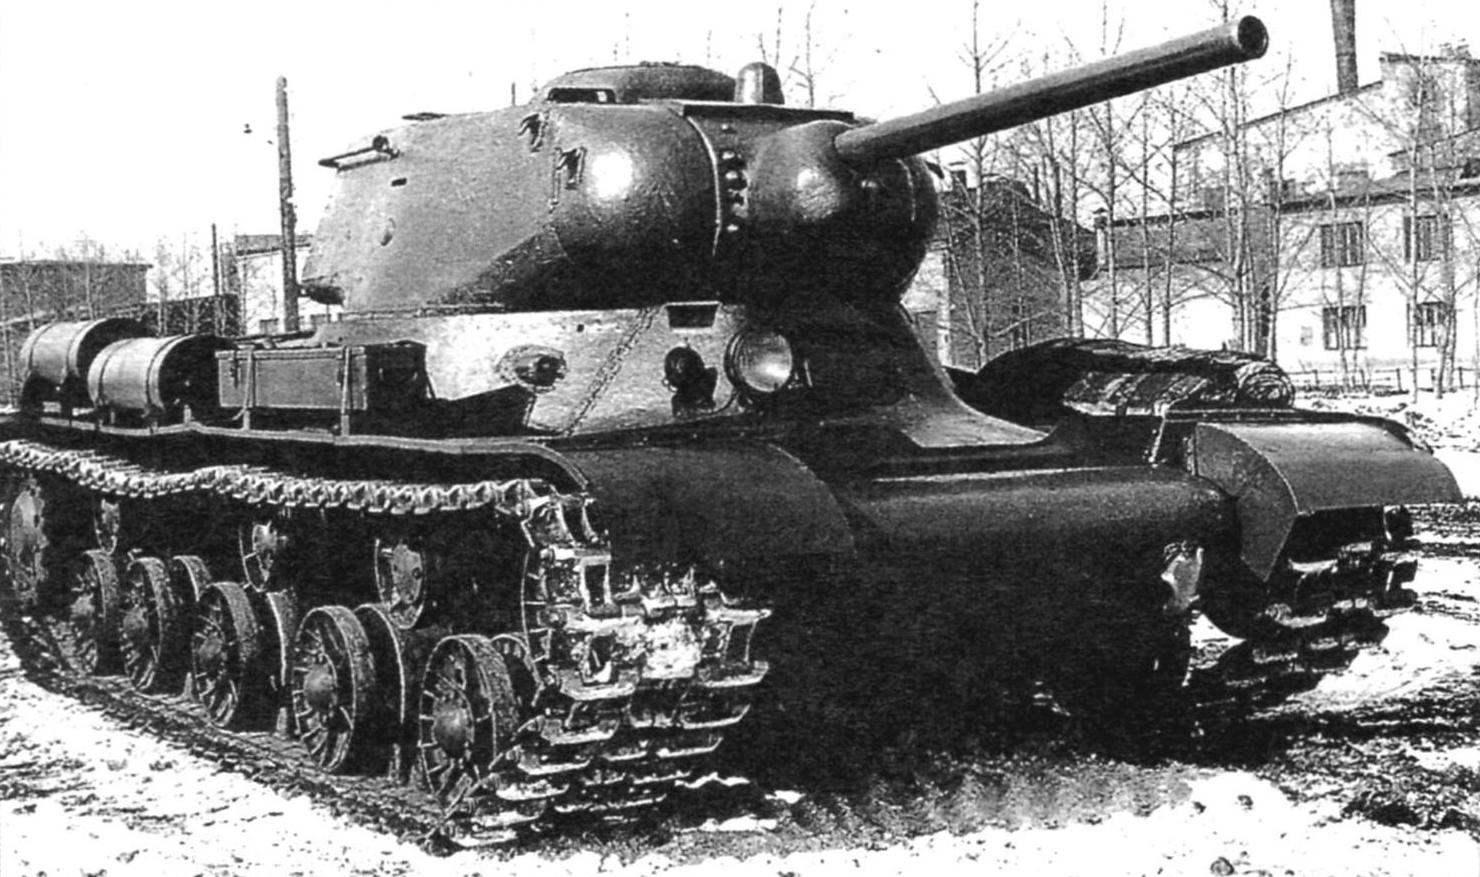 Средний танк КВ-13, вооружённый 76,2-мм пушкой ЗИС-5